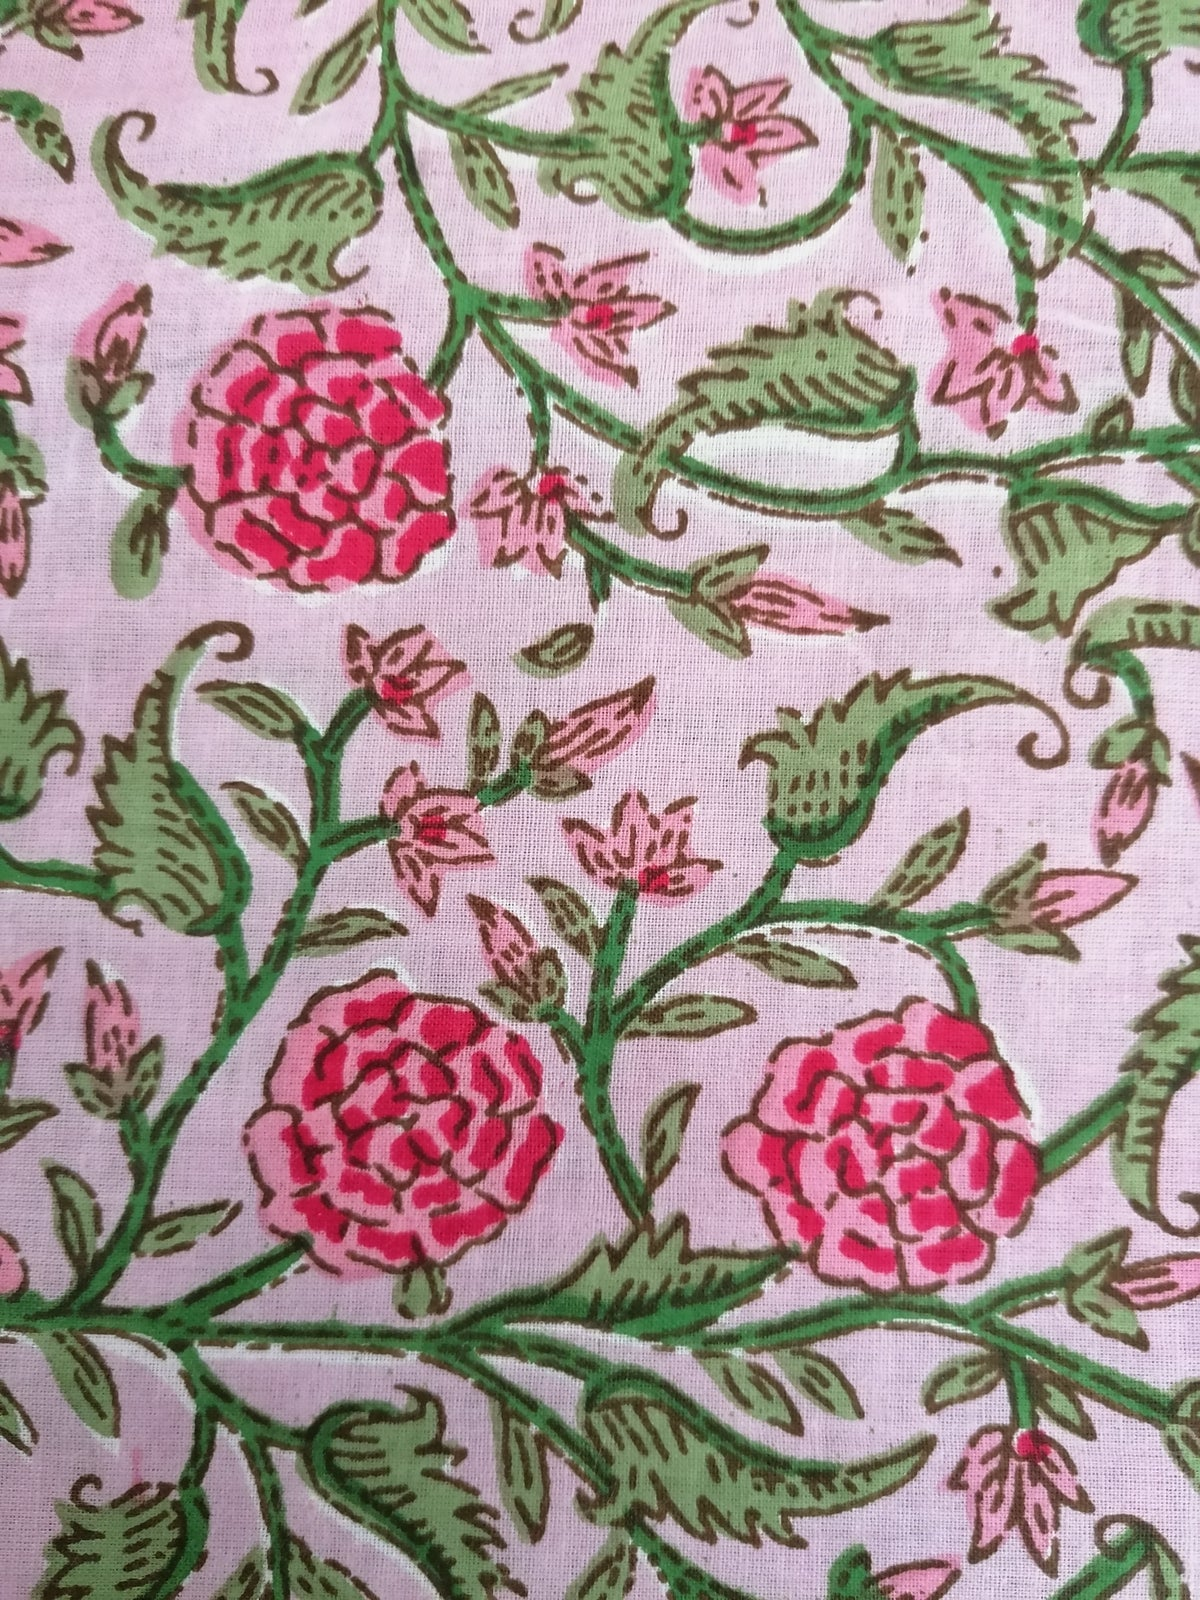 Image of Namasté fabric rosier fond rosé